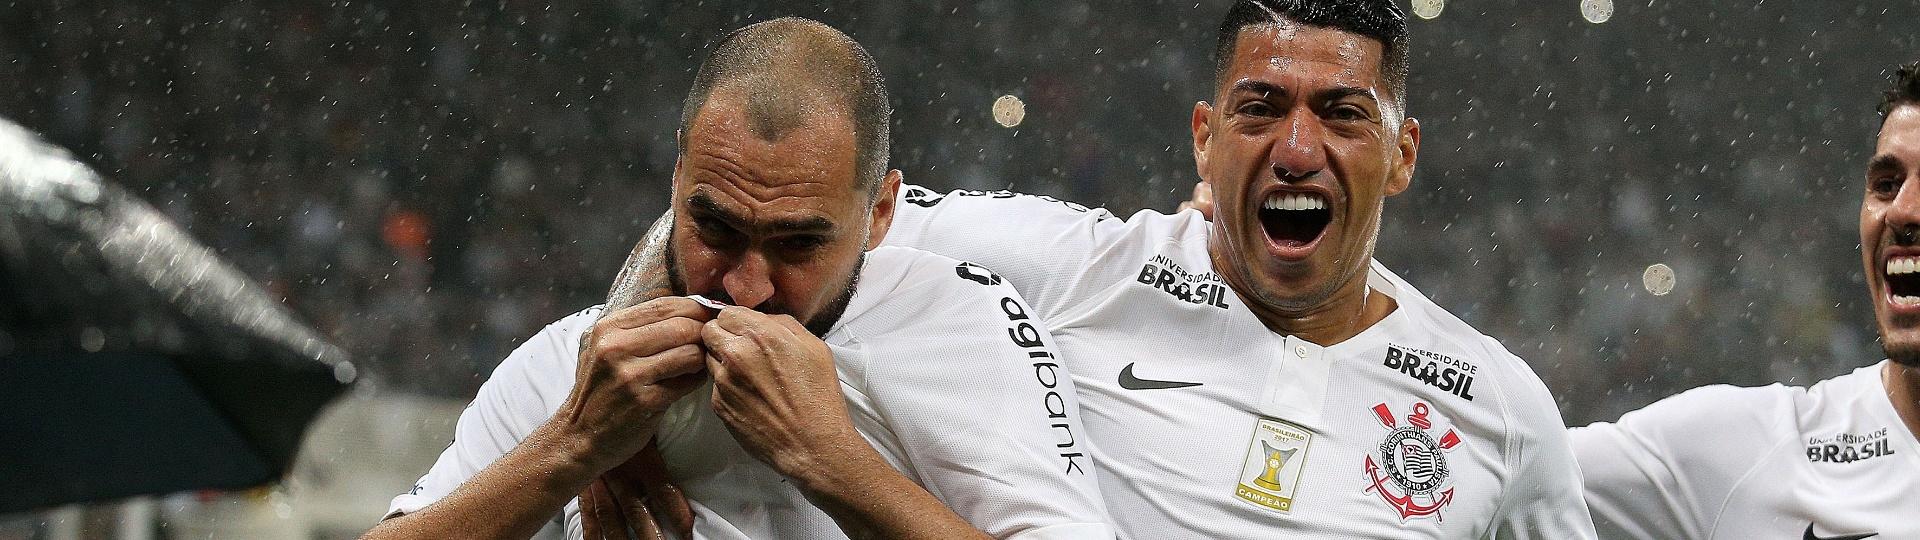 Danilo comemora o gol do Corinthians contra o Bahia